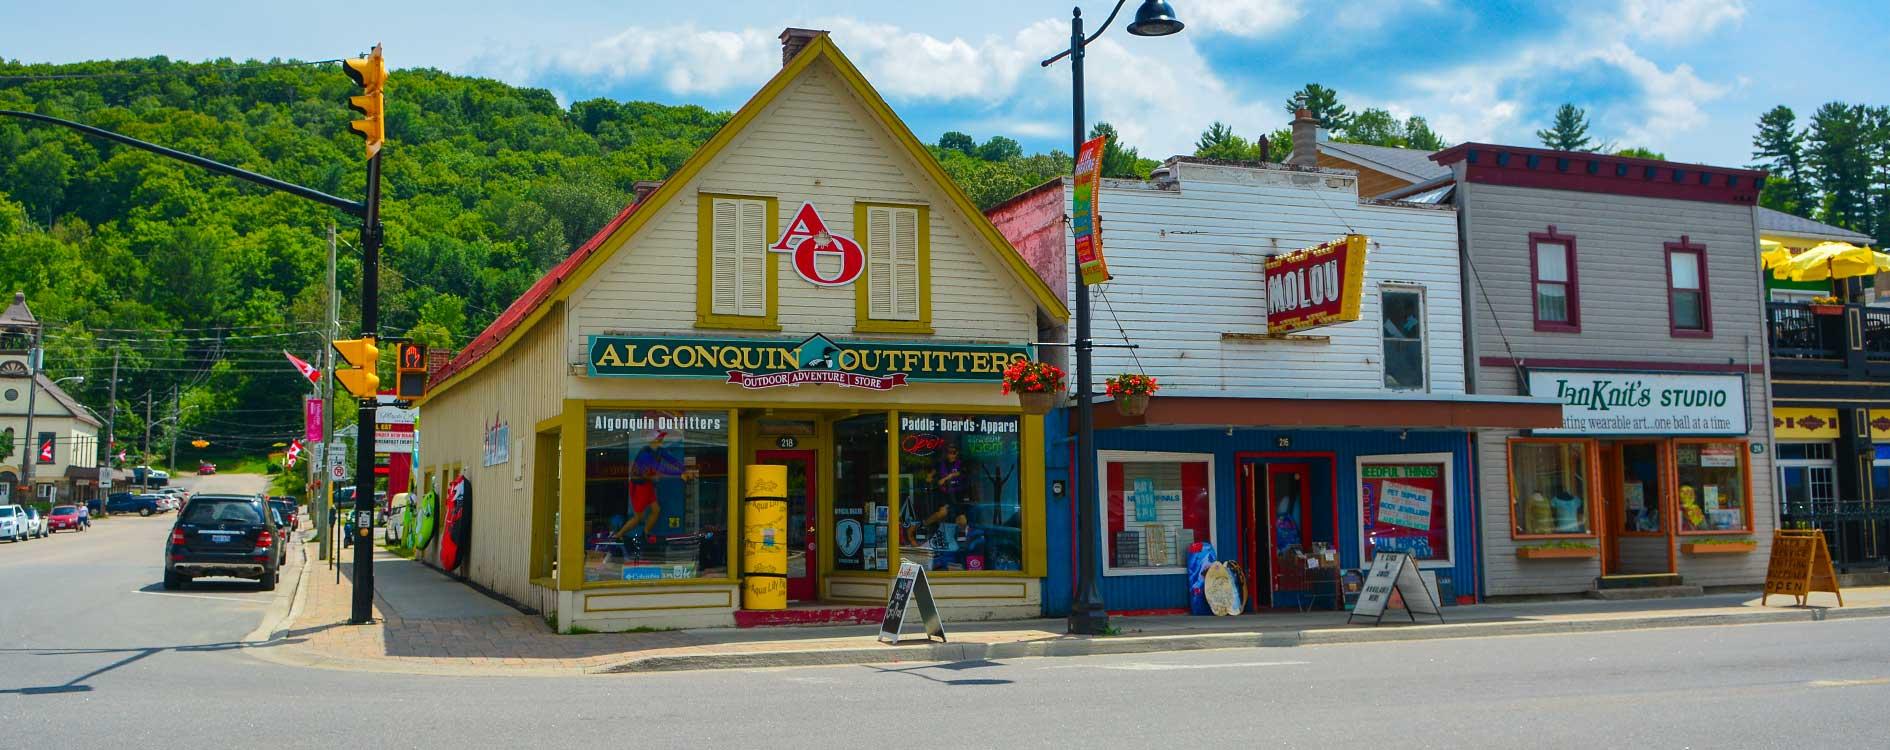 Algonquin Outfitters Haliburton